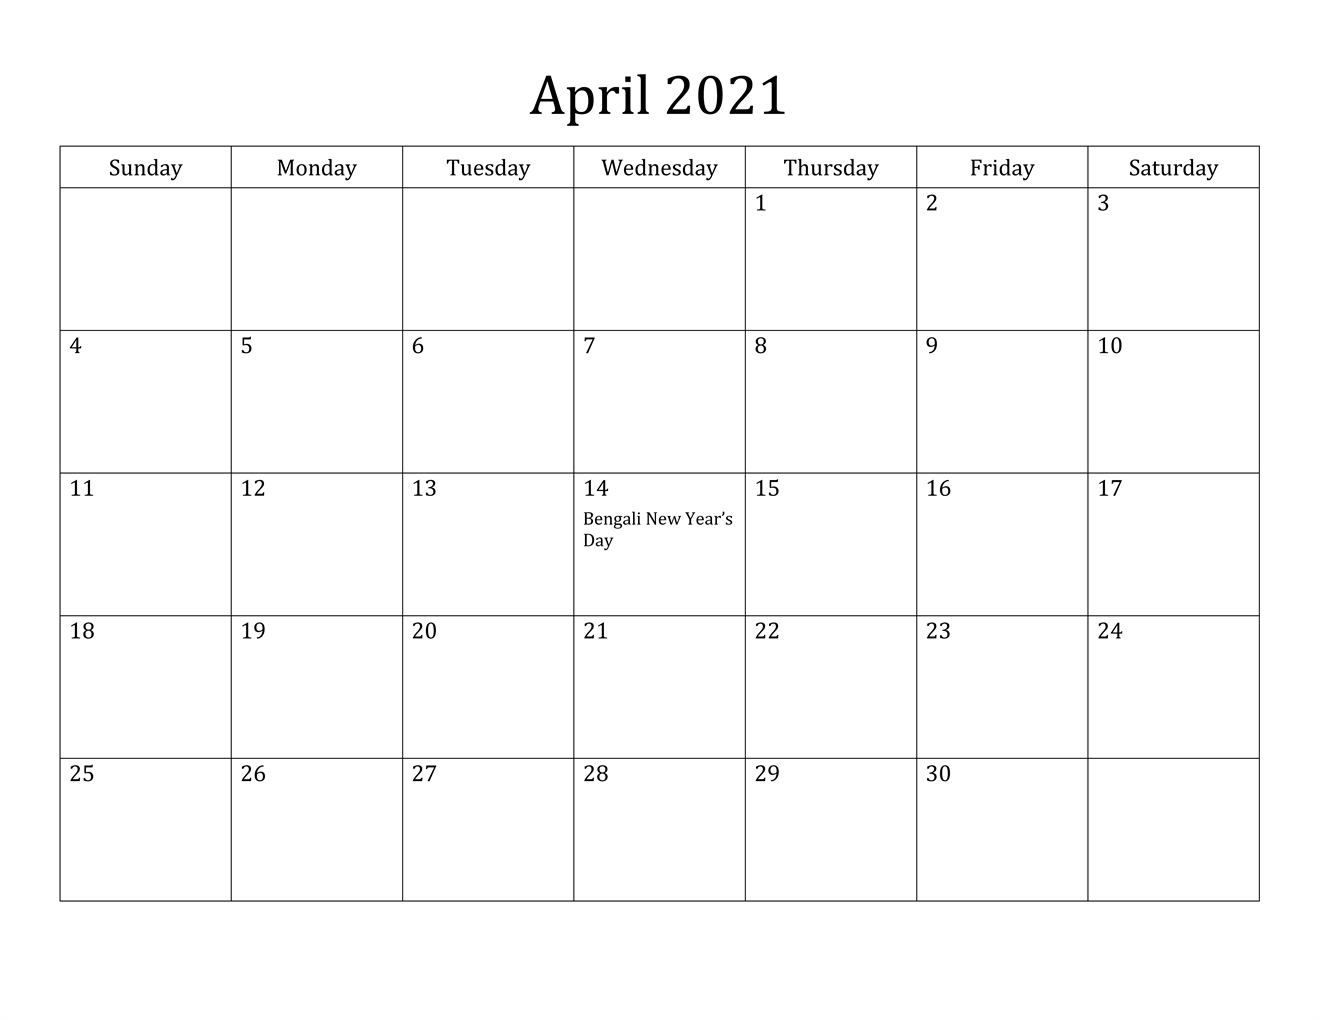 April 2021 Calendar Printable PDF